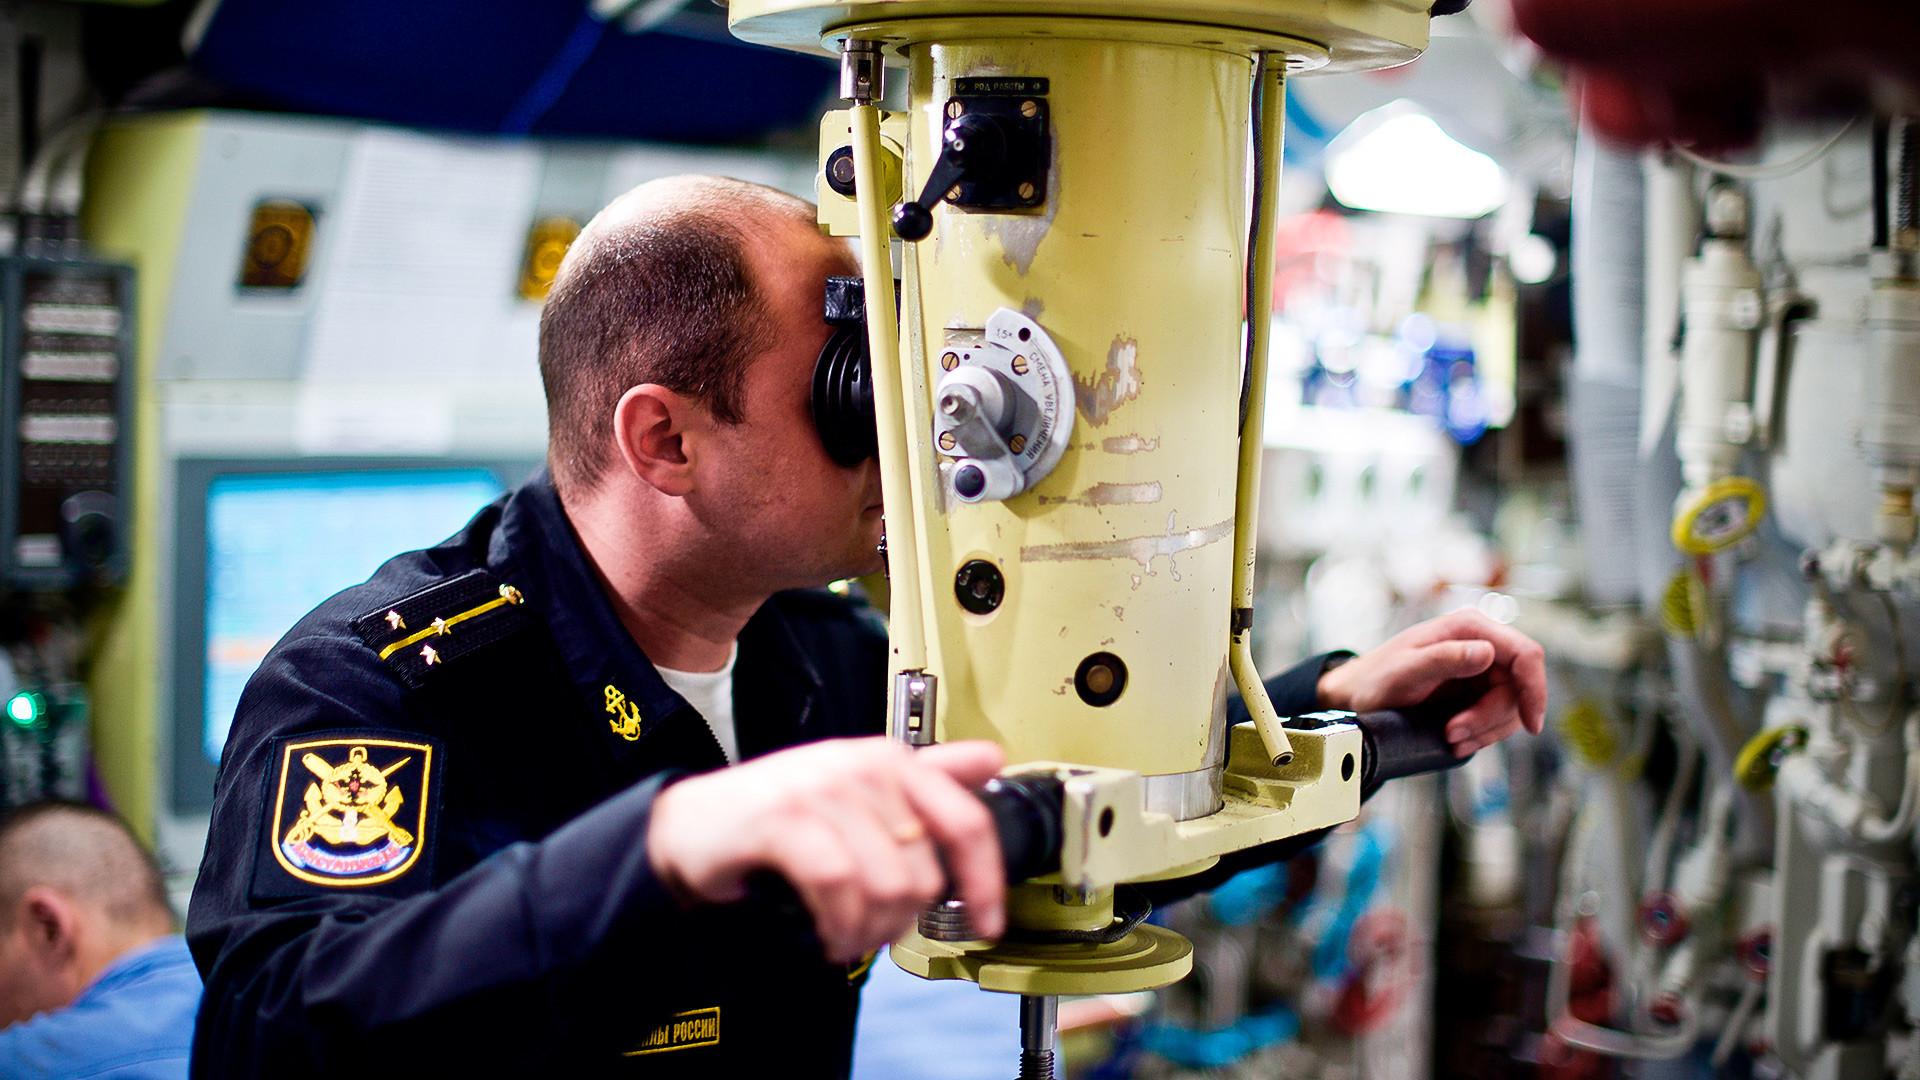 Офицер от екипажа на дизело-електрическа подводница по проект 636.3